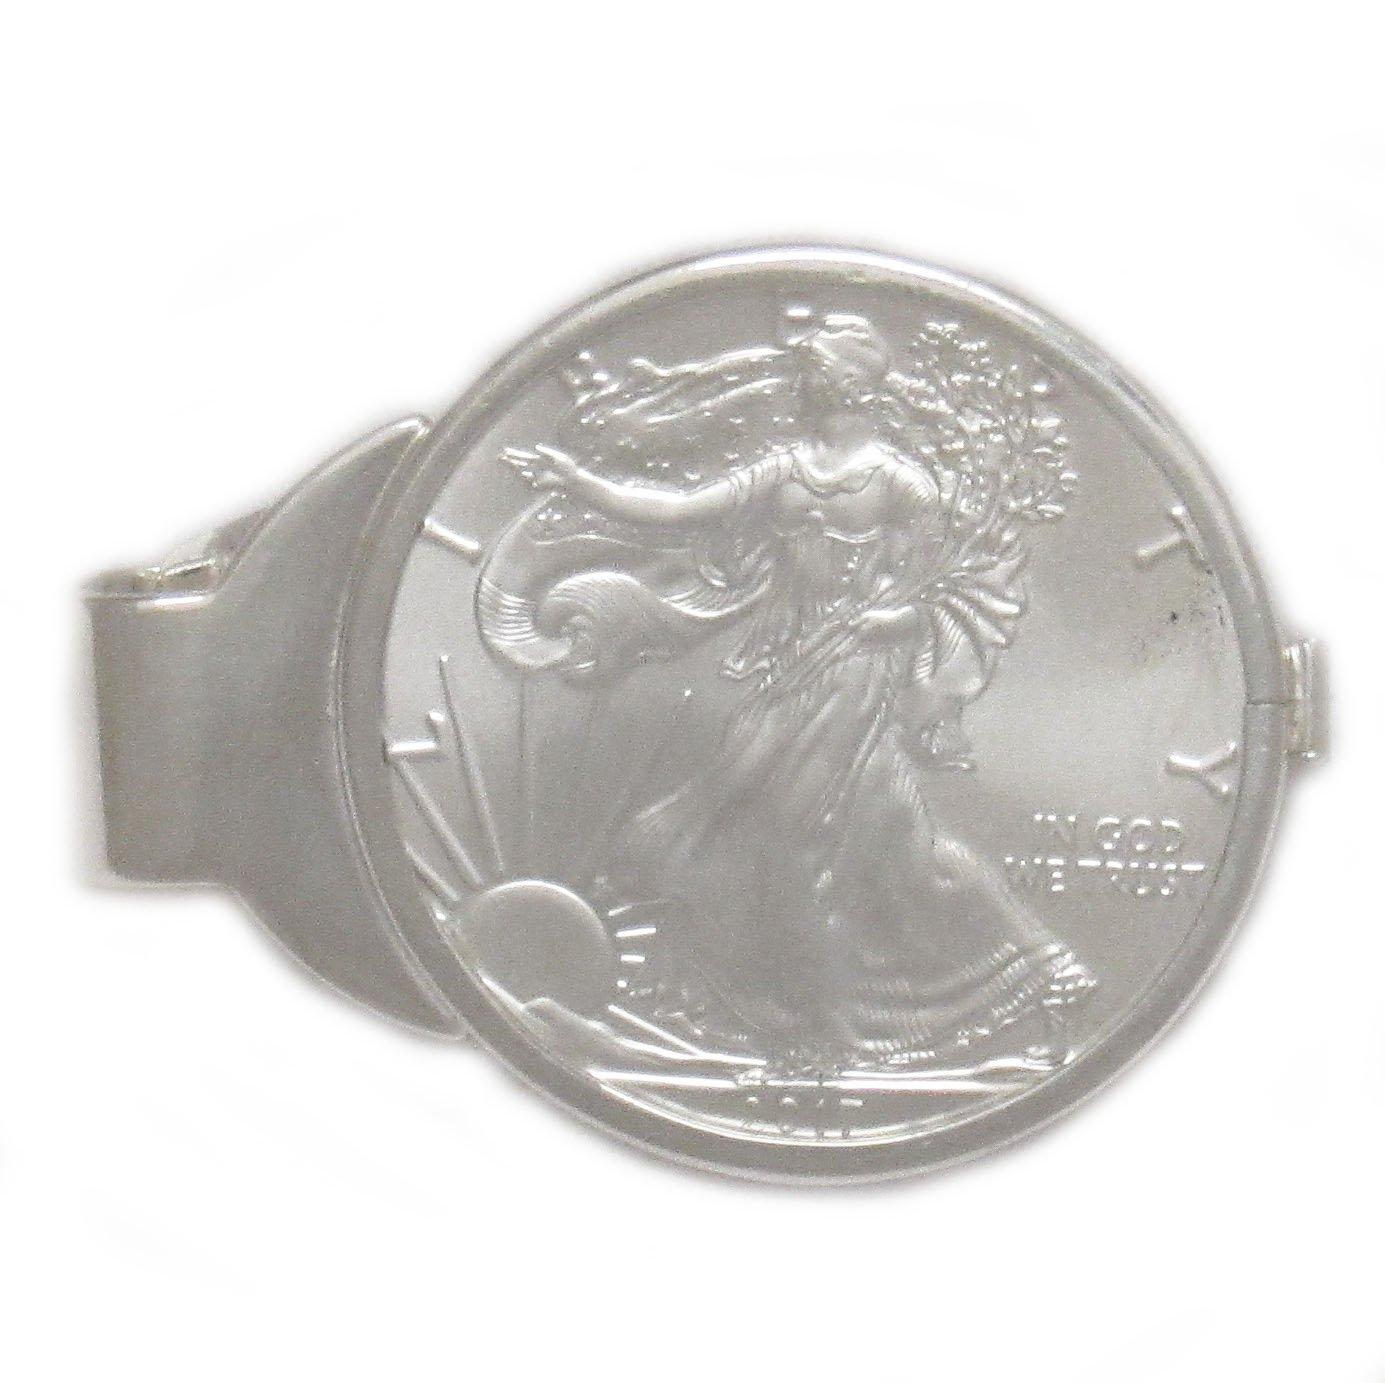 Flintski Jewlery LLC 1 oz American Silver Eagle Sterling Silver Spring Back Money Clip (2017)